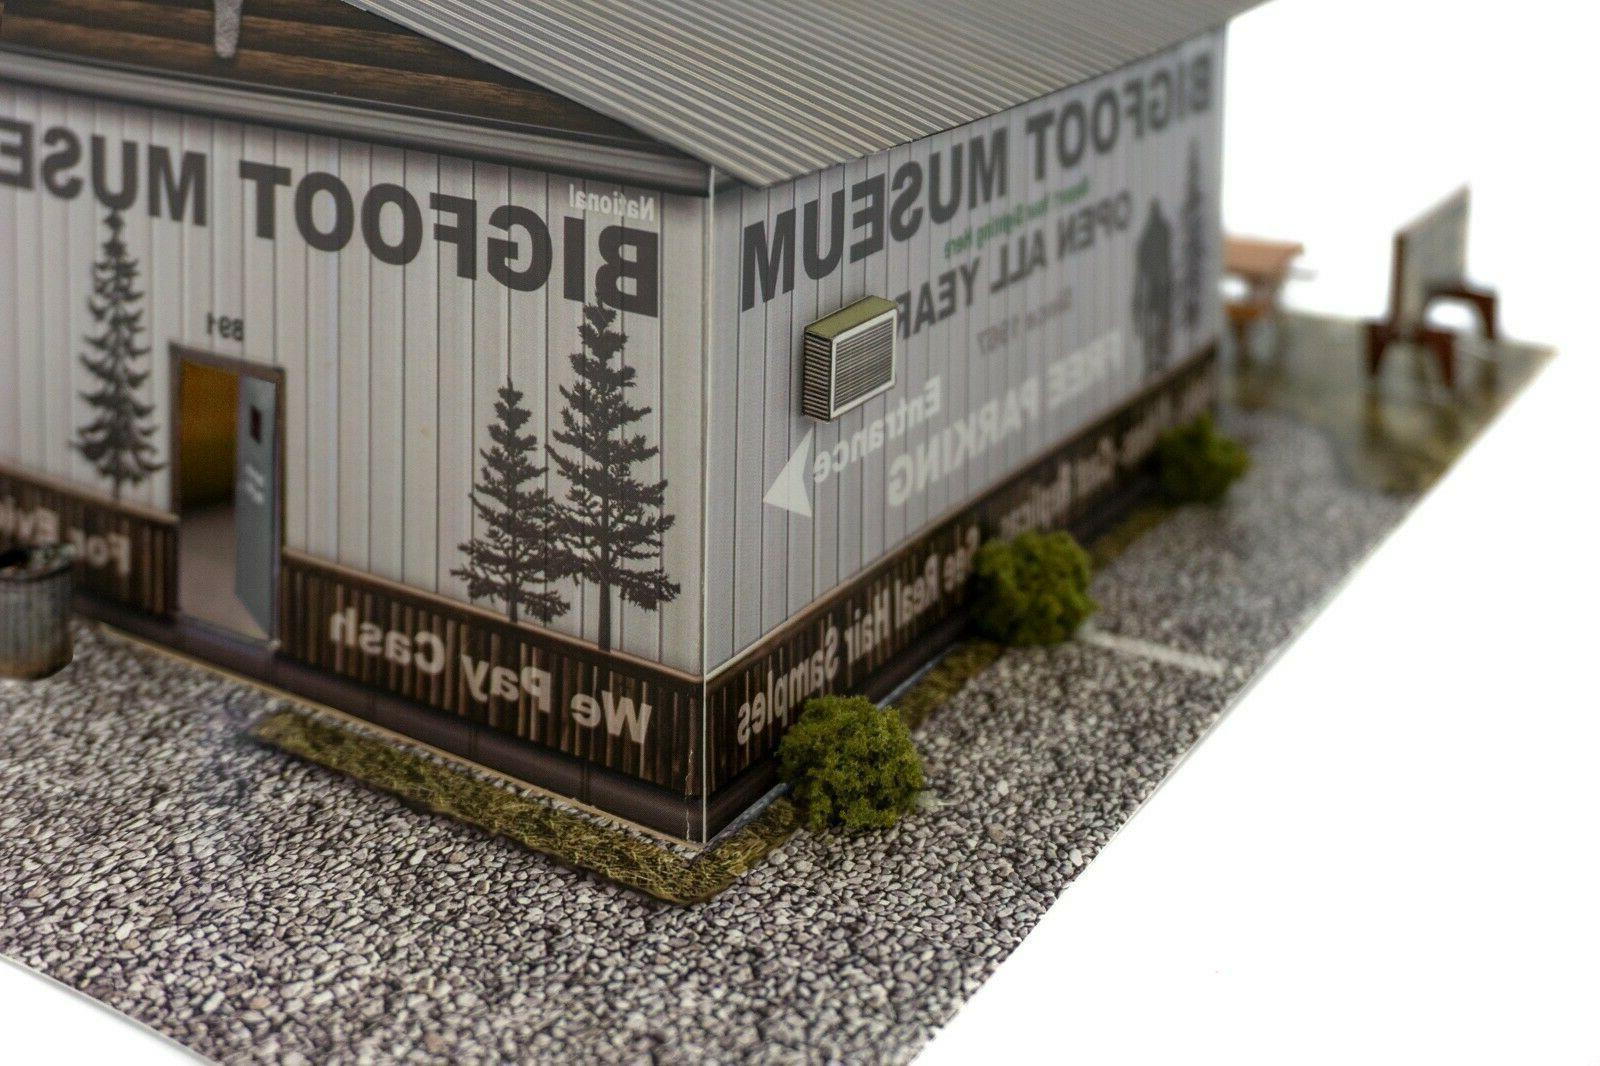 1/48 Bigfoot Model Build Sasquatch Collectibles